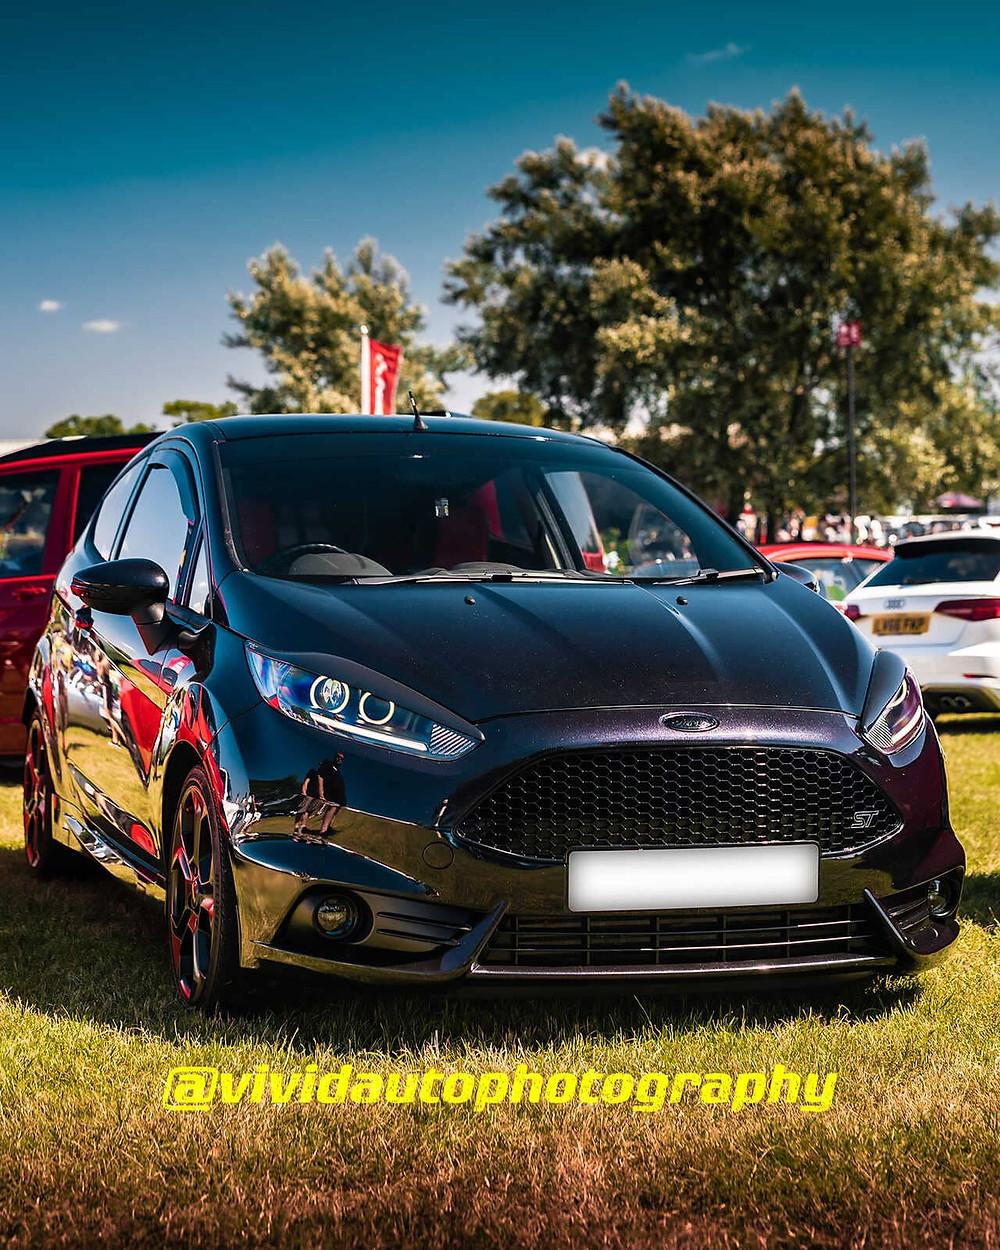 Ford Fiesta ST | Tunerfest | Oulton Park